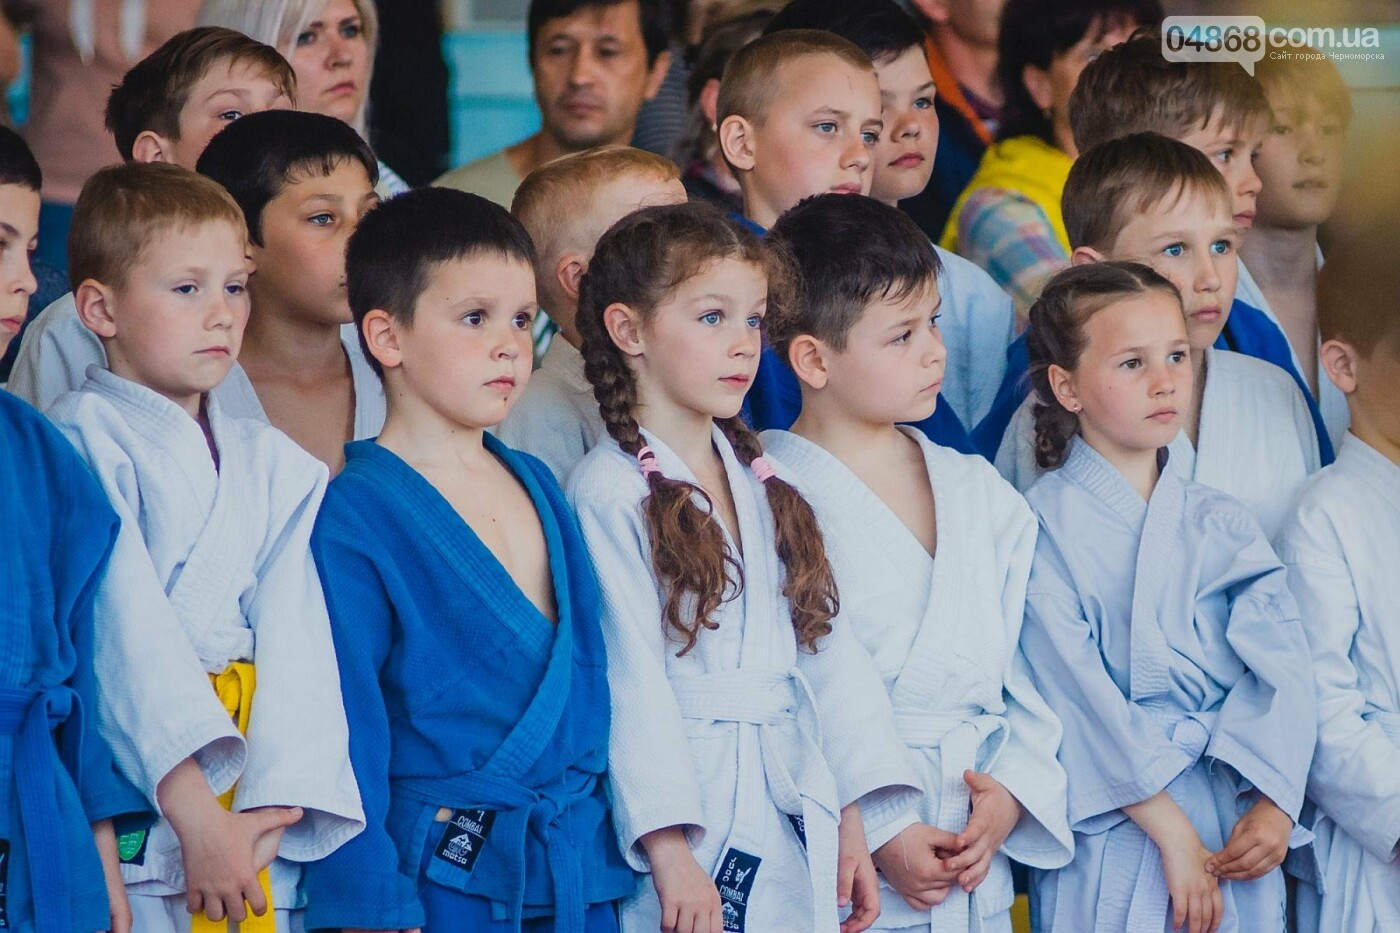 В Черноморске прошел турнир по дзюдо на Кубок мэра, фото-14